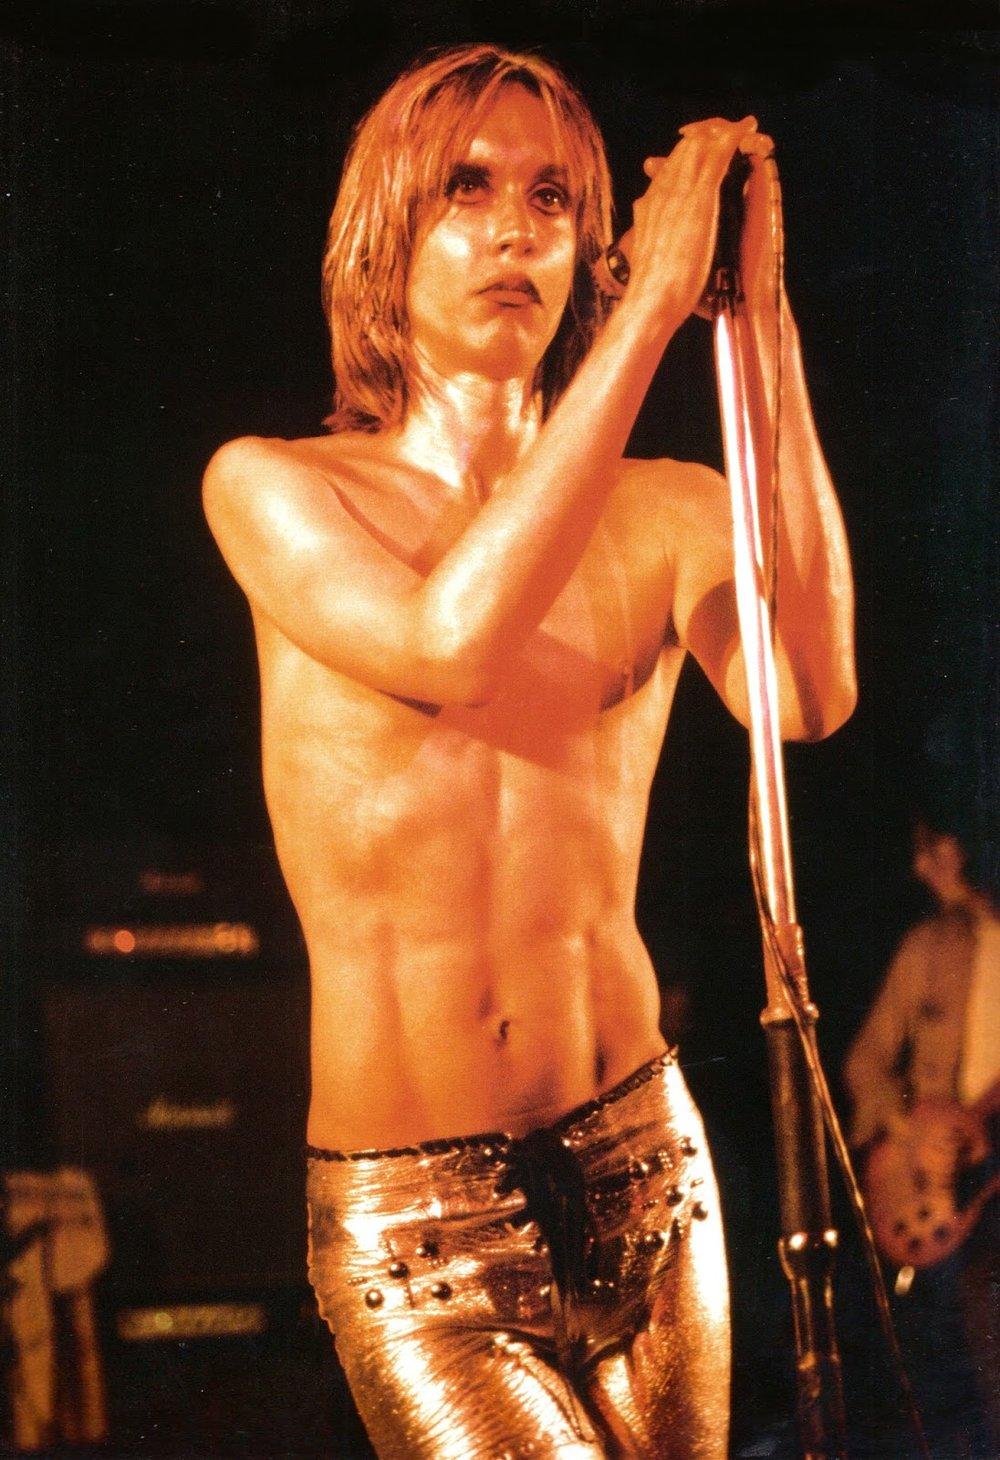 Iggy & The Stooges - Kings Cross Cinema, London, 7-15-72 (12).jpg